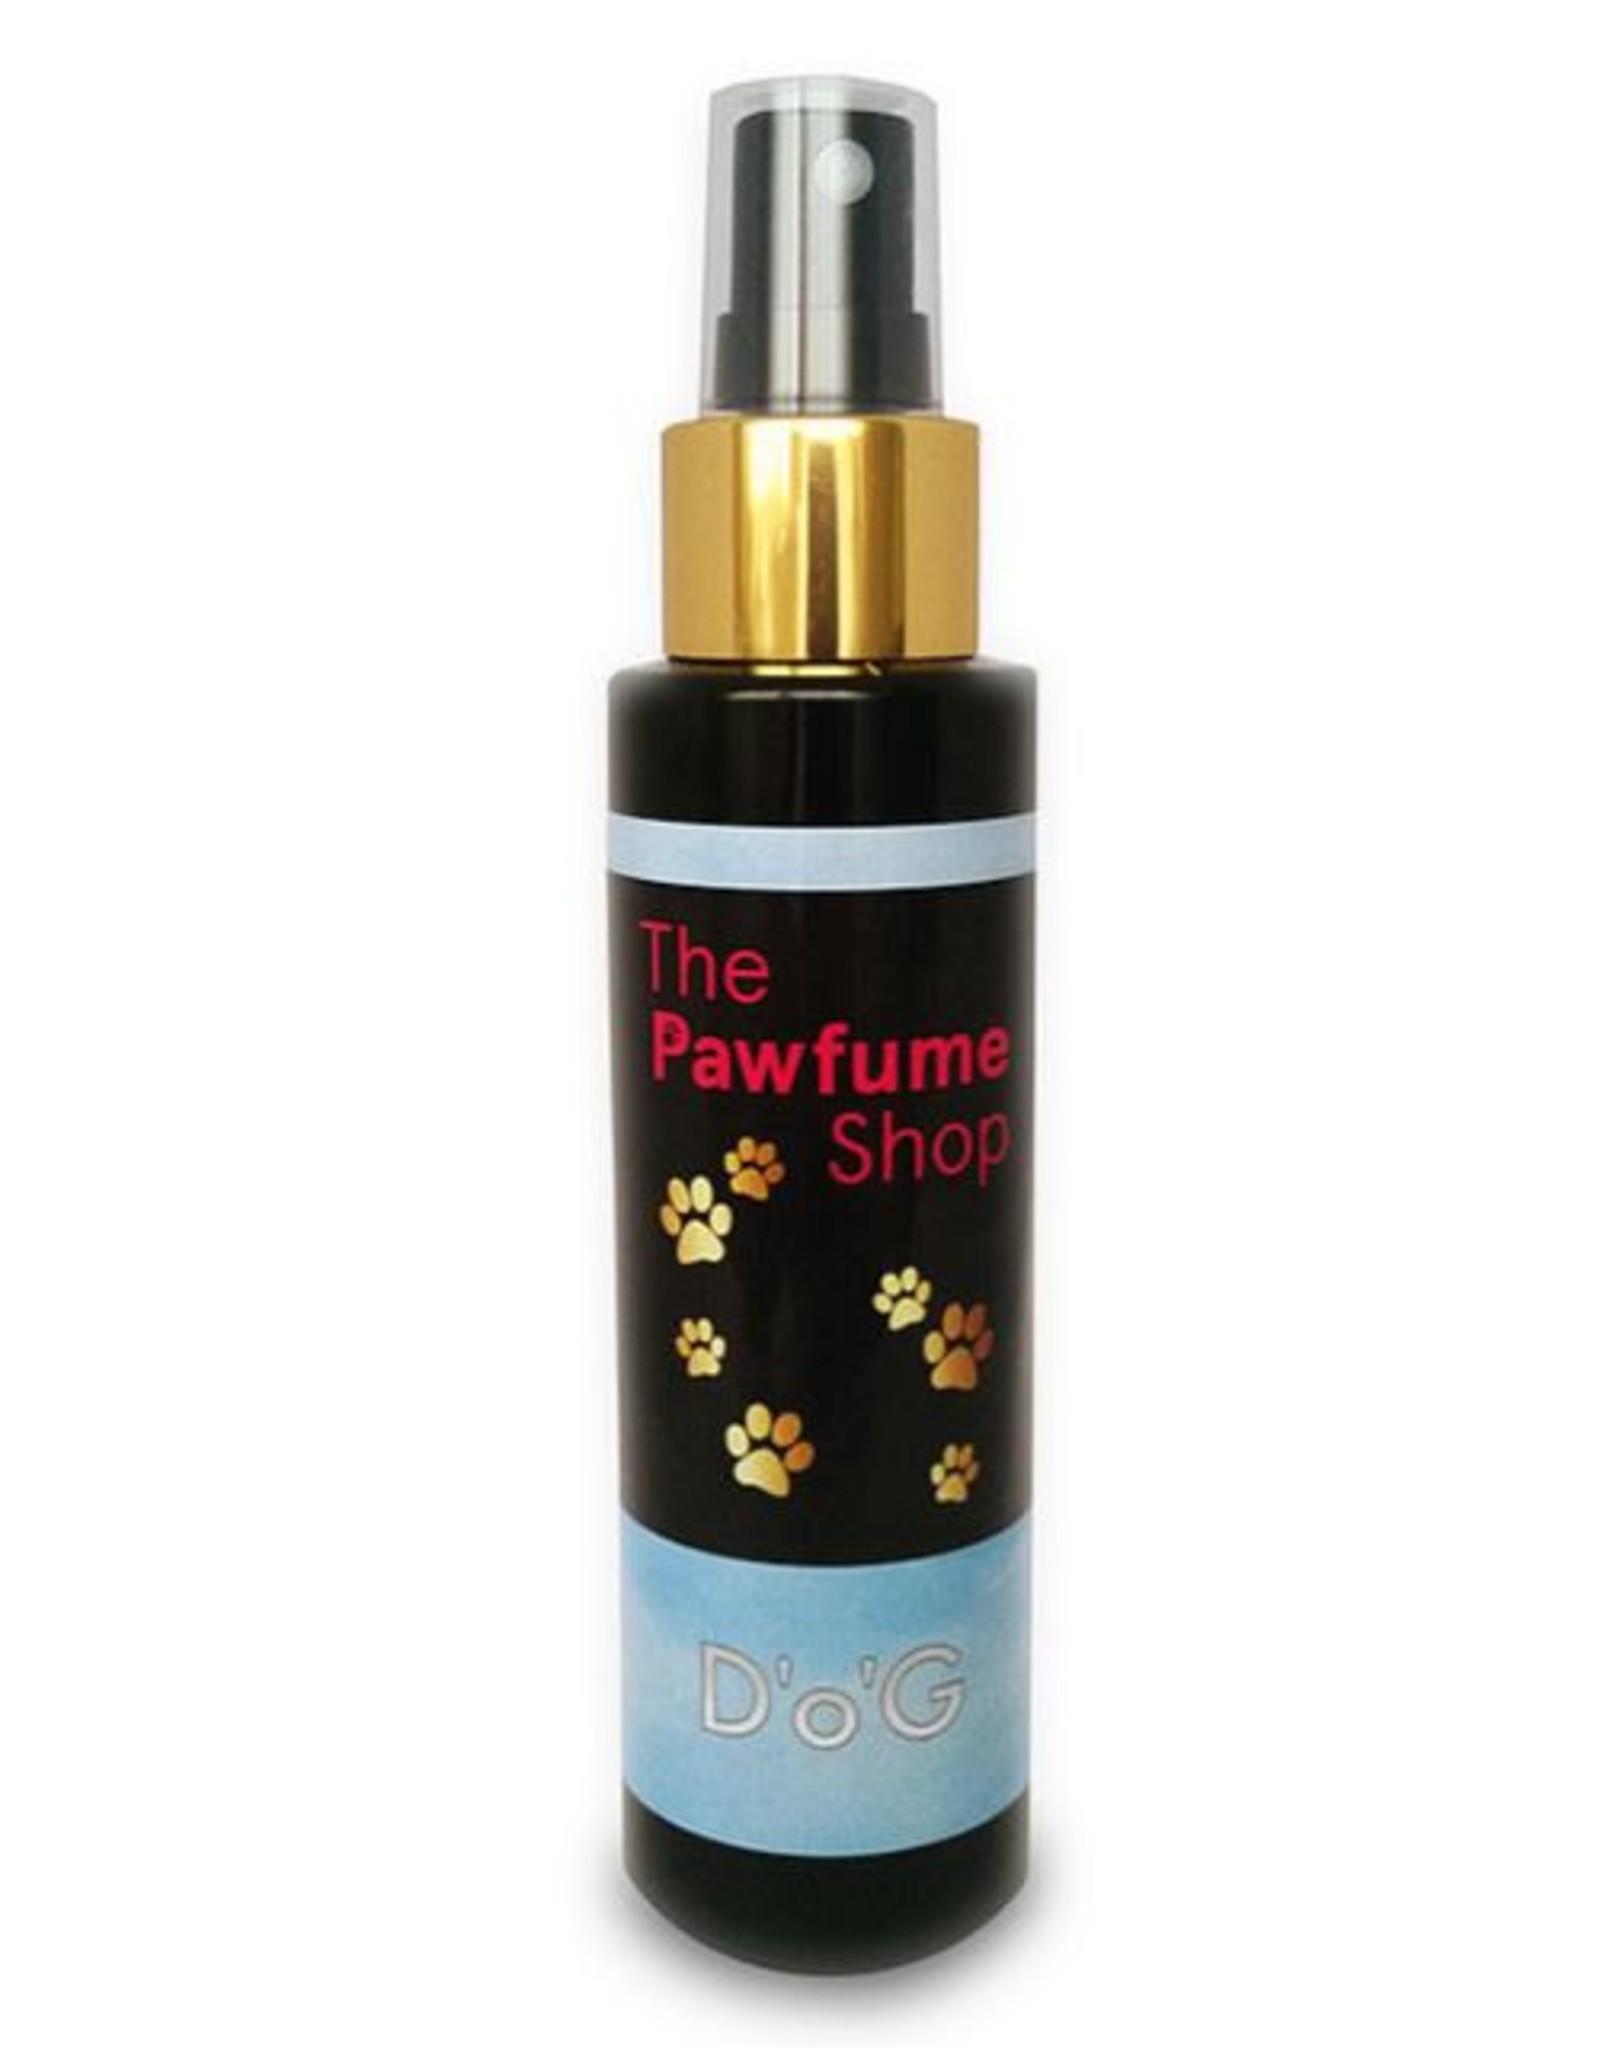 The Pawfume Shop D'o'G Fragranced Body Spray 100ml